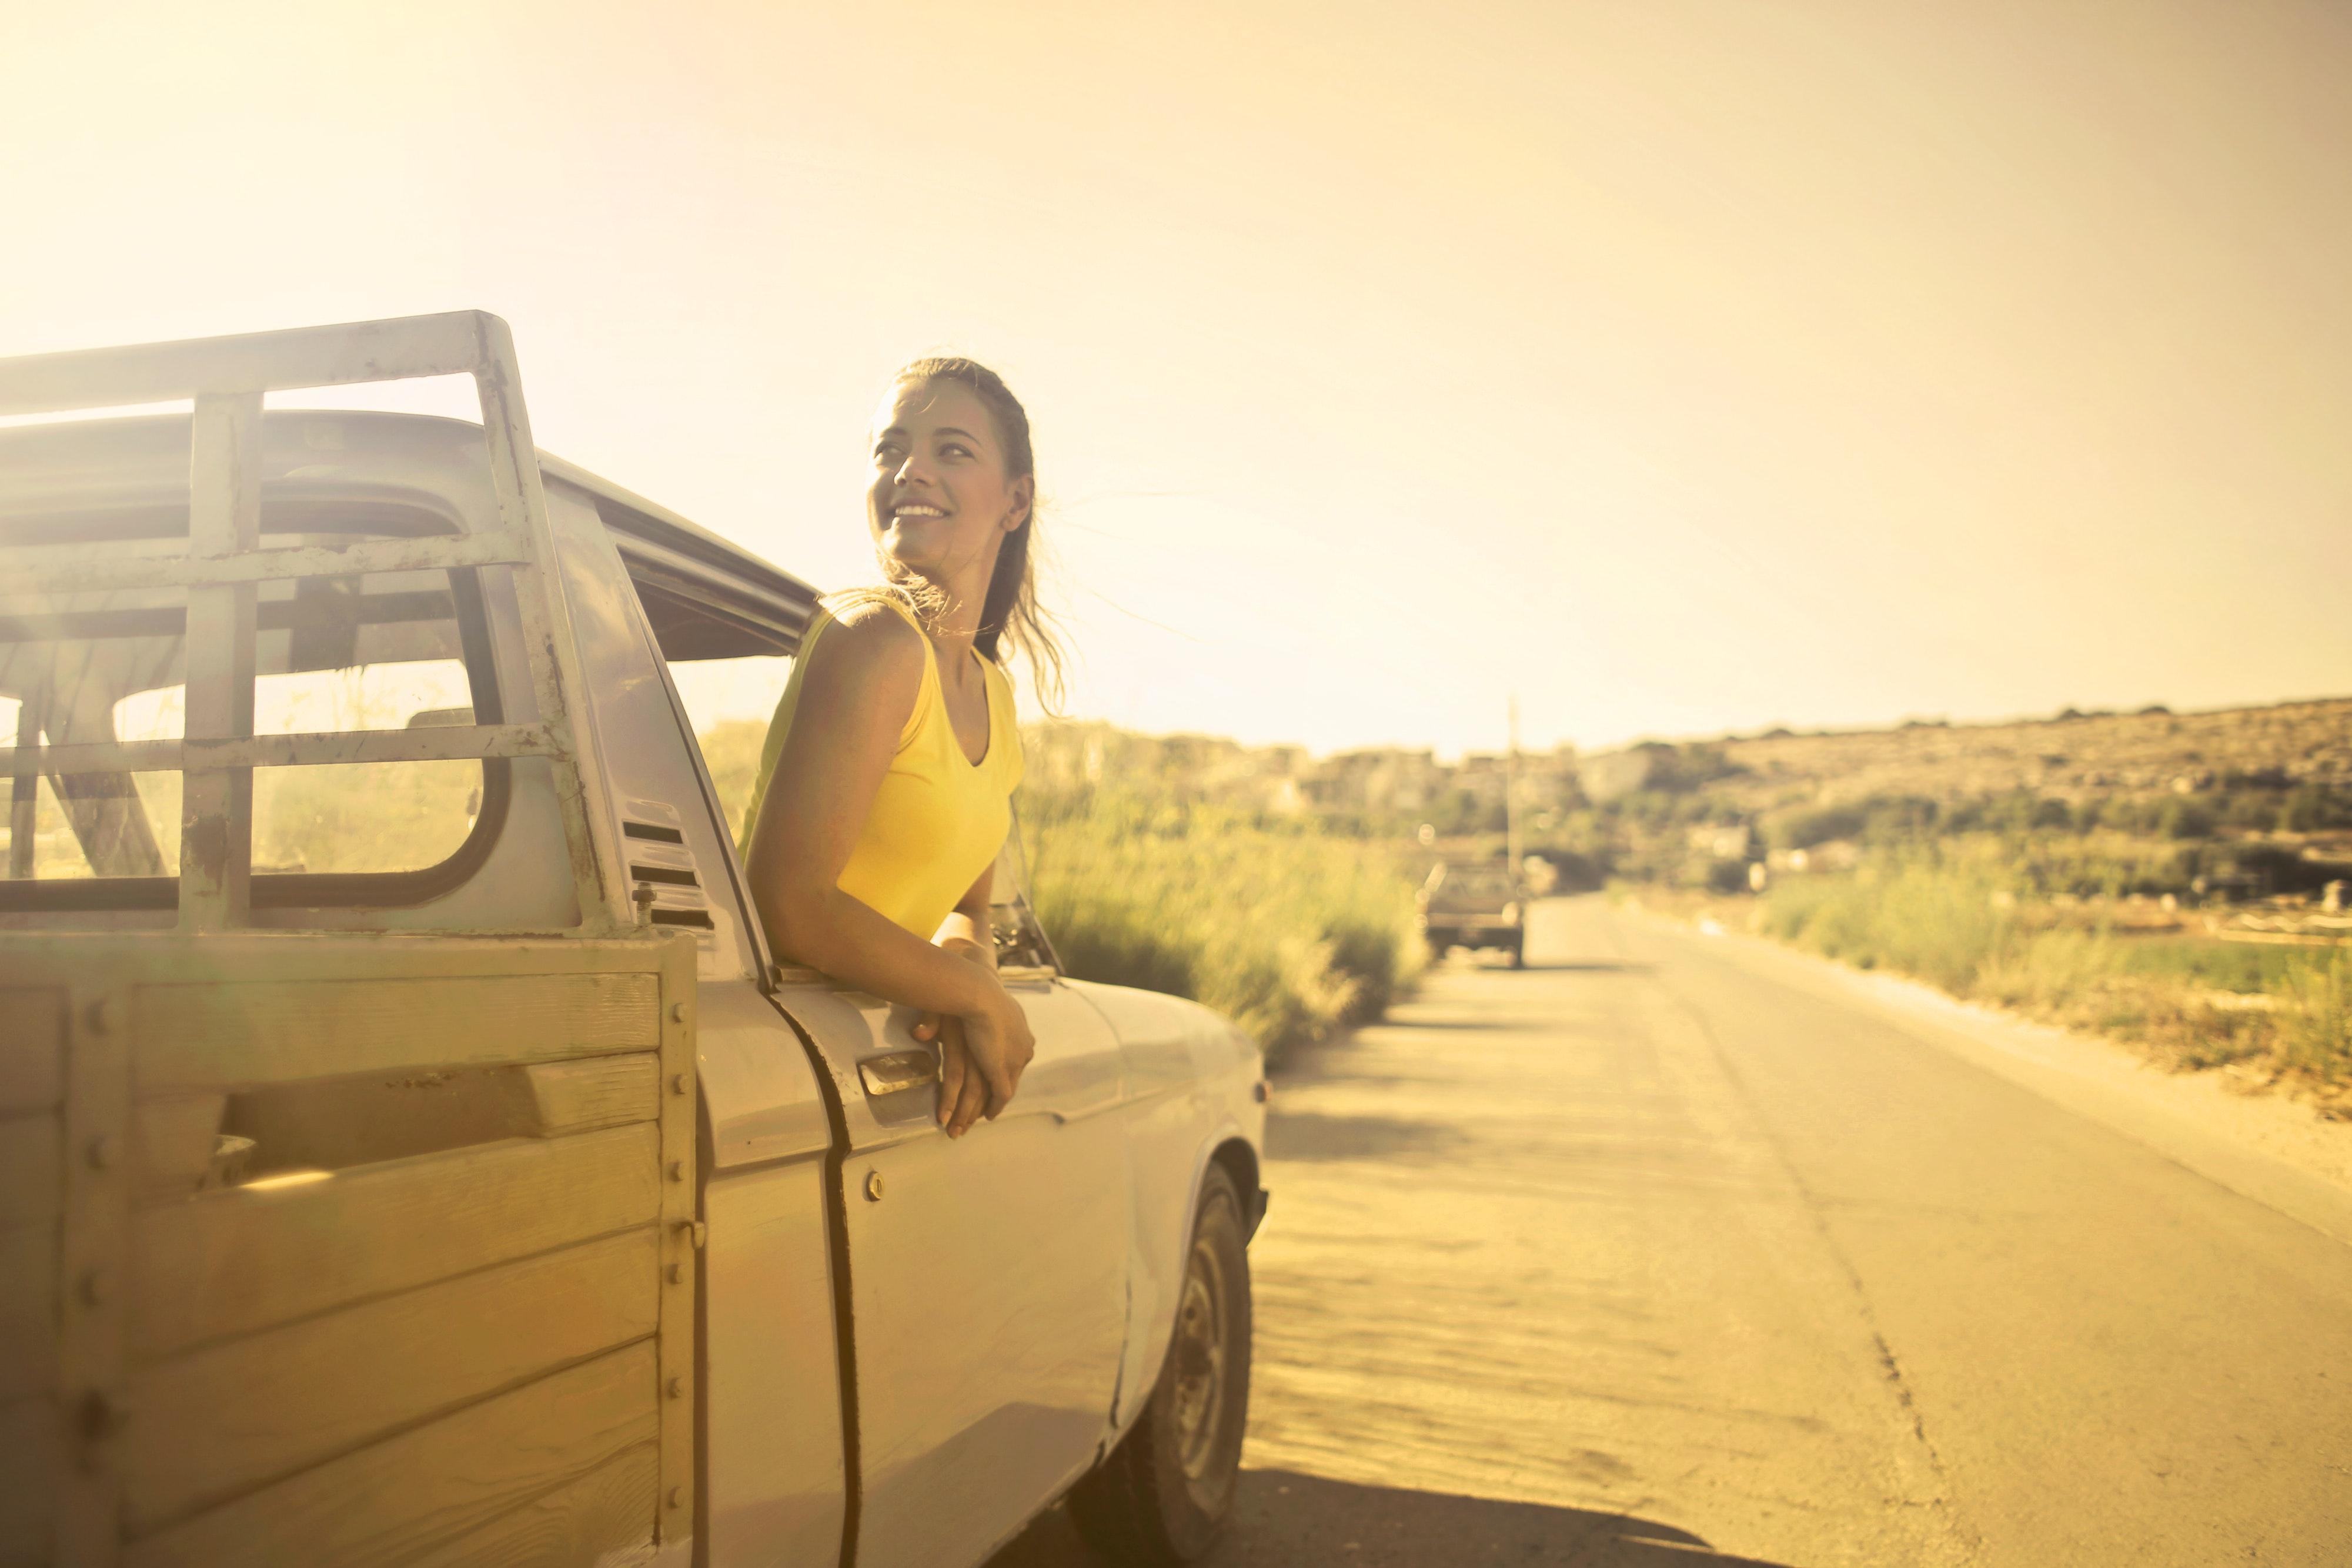 Woman Wearing Yellow Shirt Inside Pickup Truck, Travel, Street, Summer, Sun, HQ Photo